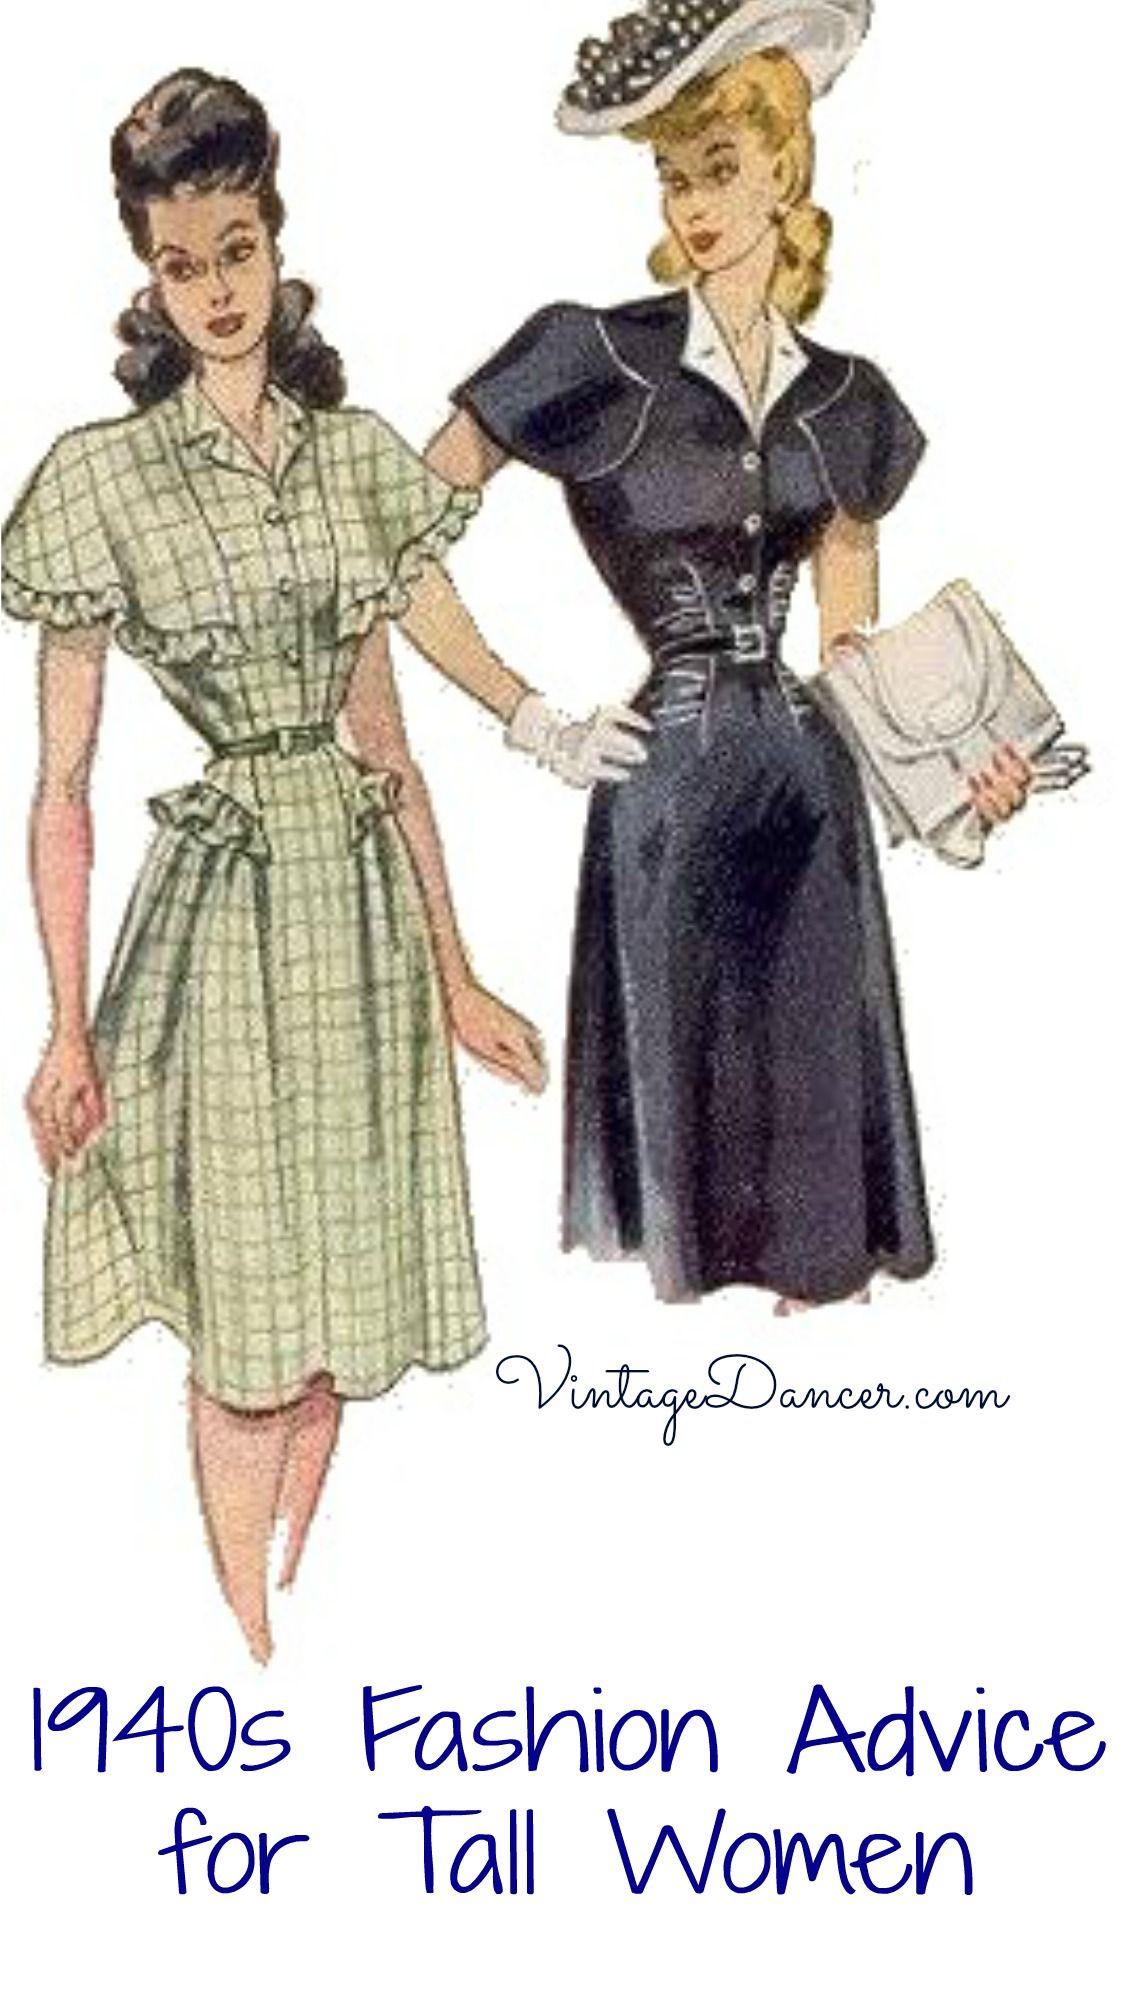 1940s Fashion Advice for Tall Women | Vintage Fashion ...